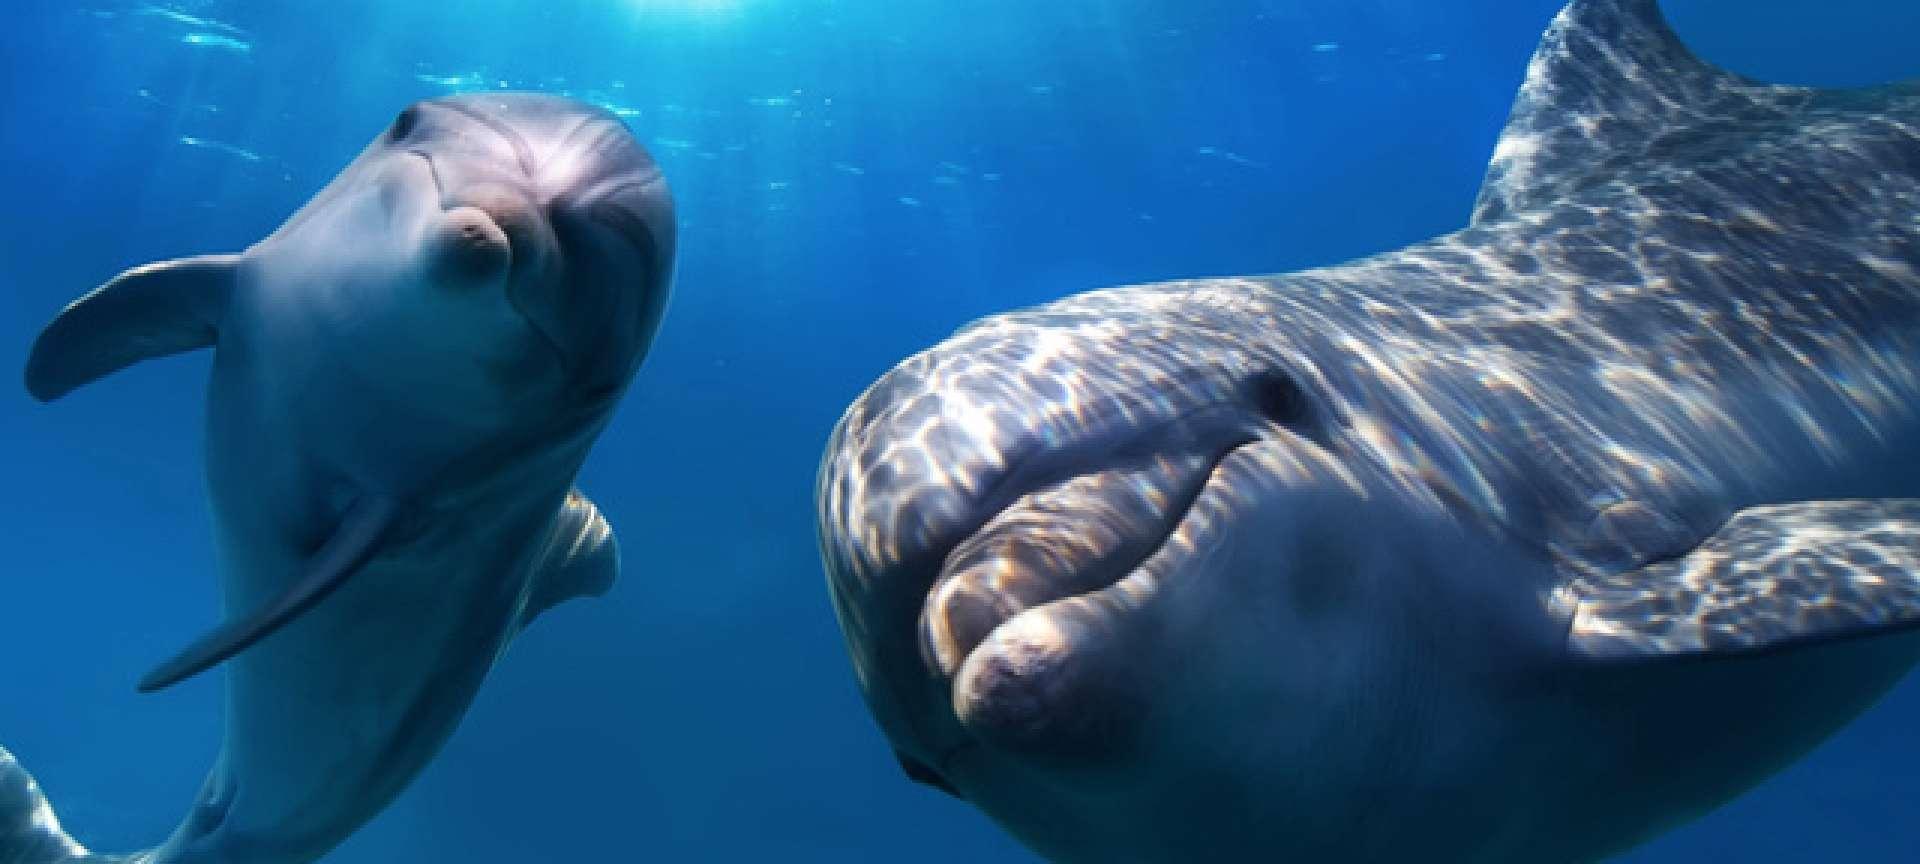 Dolphin excusions are a major drawcard in Kizimkazi